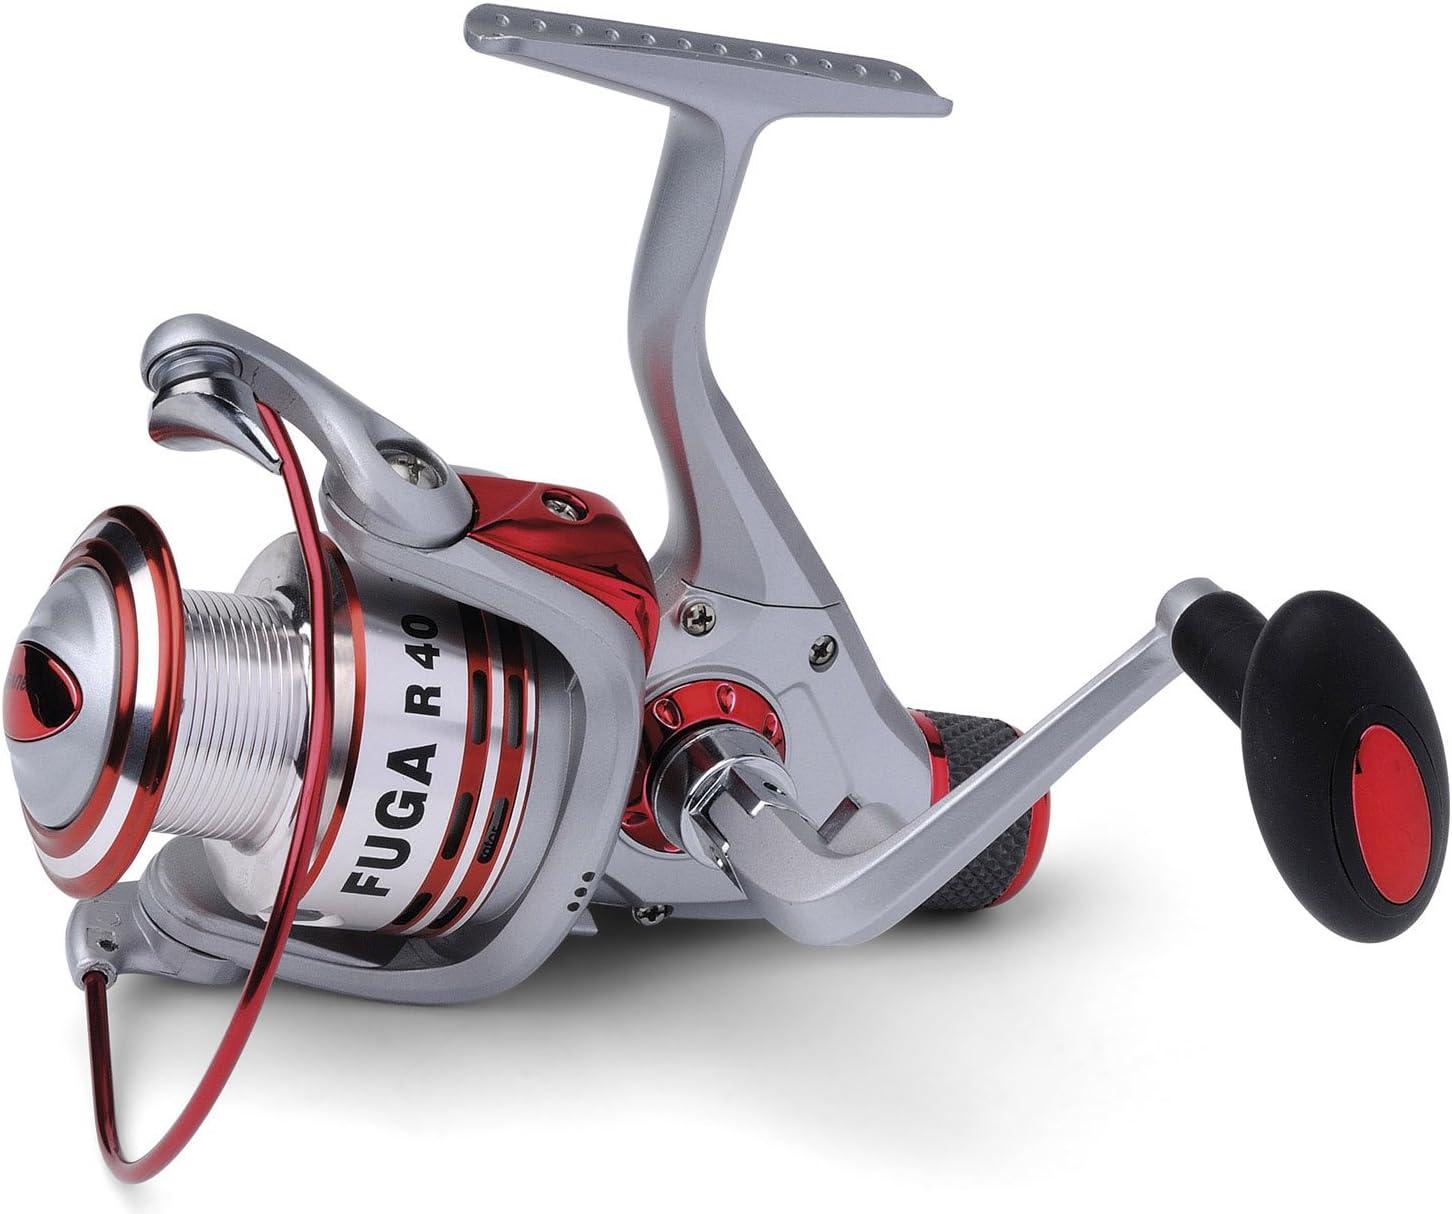 Hilo de FUGA R-Rear Drag-Spinning Match-Fishing Reels Gris claro ...